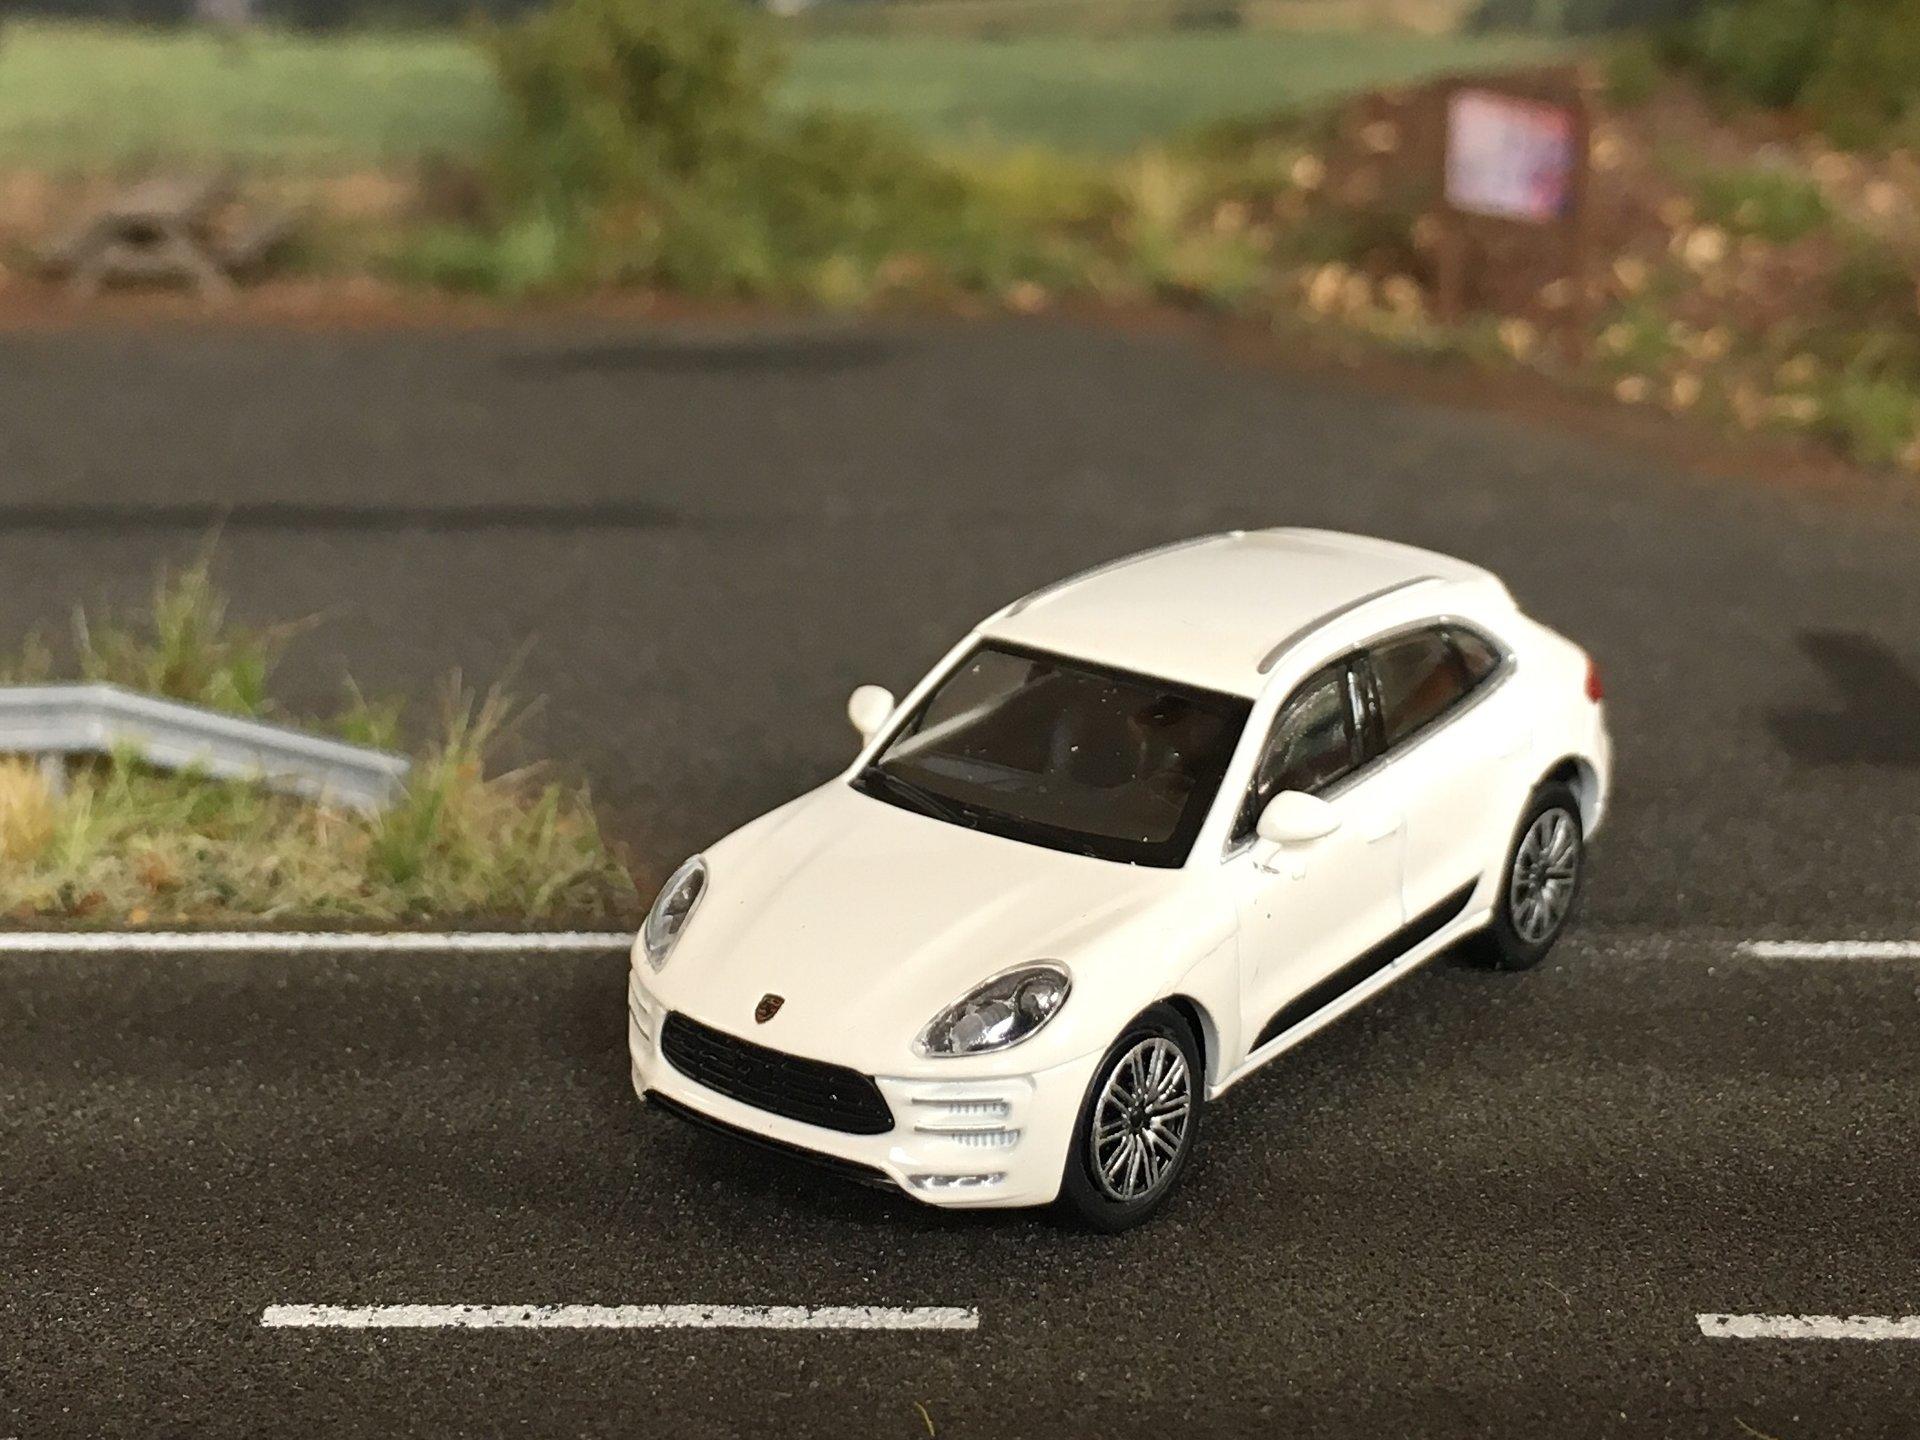 Porsche Macan Turbo 02.jpg